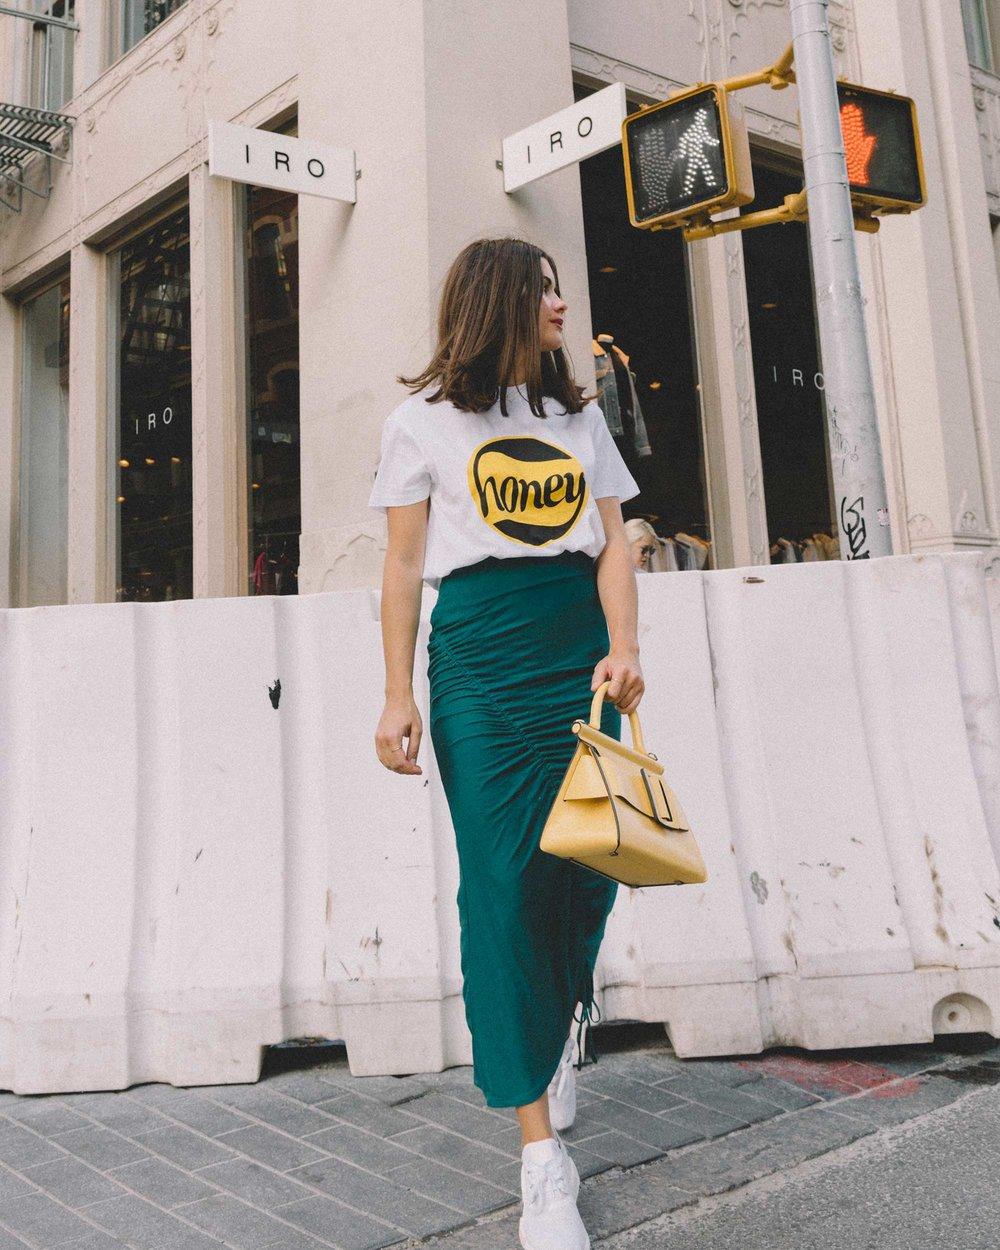 GANNI Honey T-Shirt, House of Harlow 1960 Ruching Midi Skirts High Waisted Skirts Mesh Sheer Turquoise Skirts, Boyy Karl 24 buckled leather tote yellow6.jpg